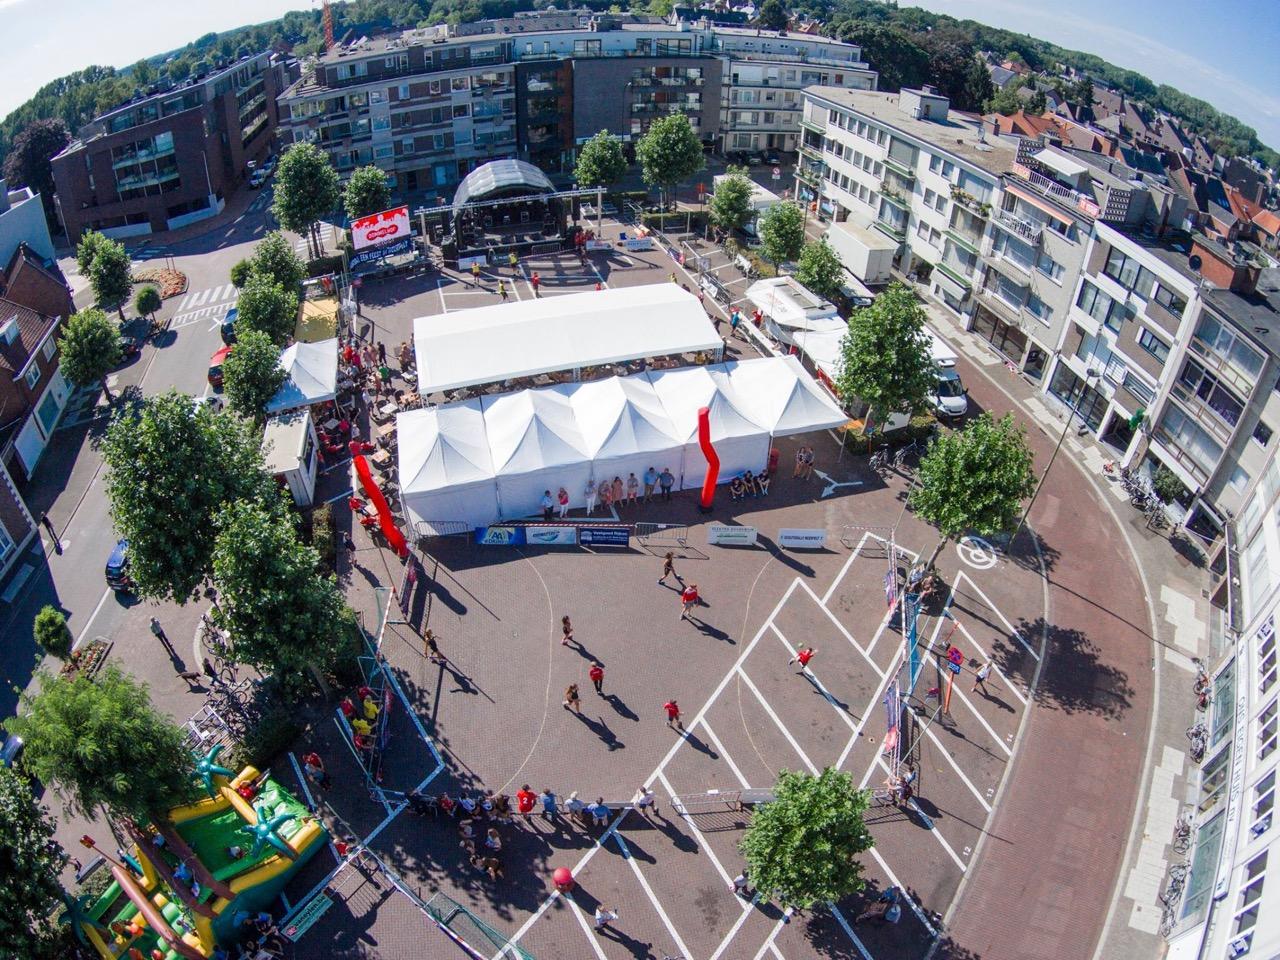 drone photo SH street handball event sporting nelo belgium 2015 1